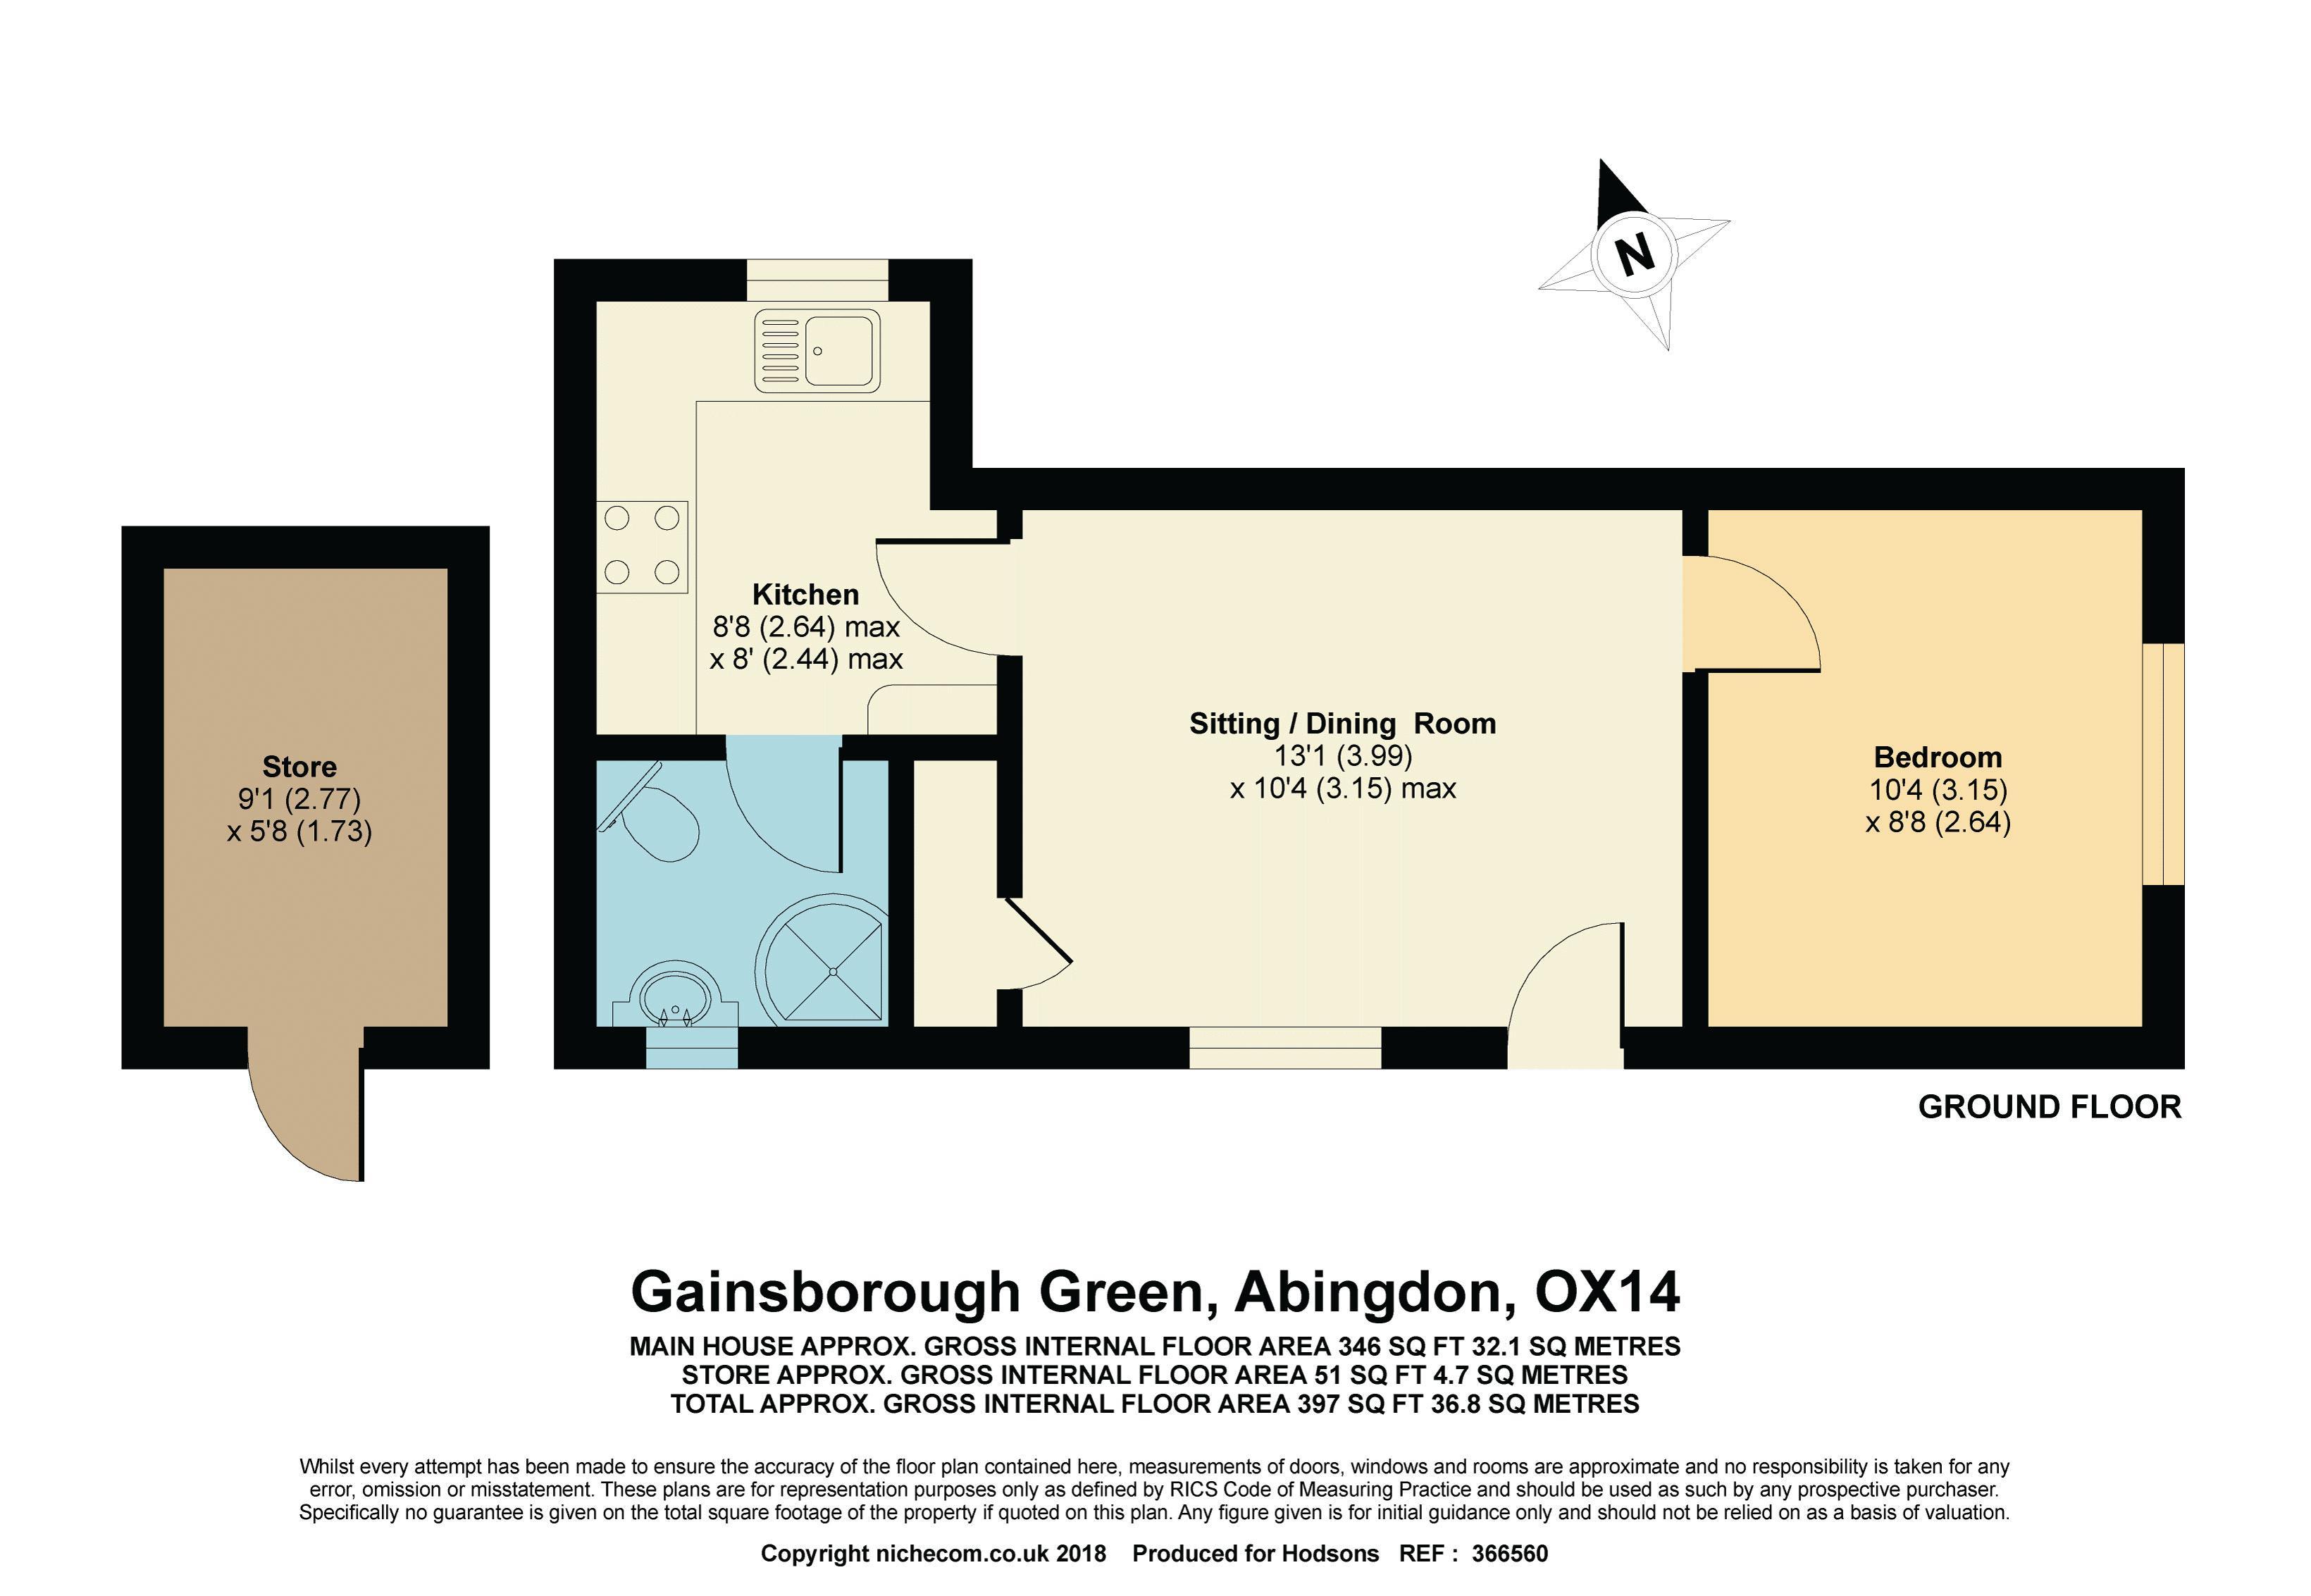 Gainsborough Green